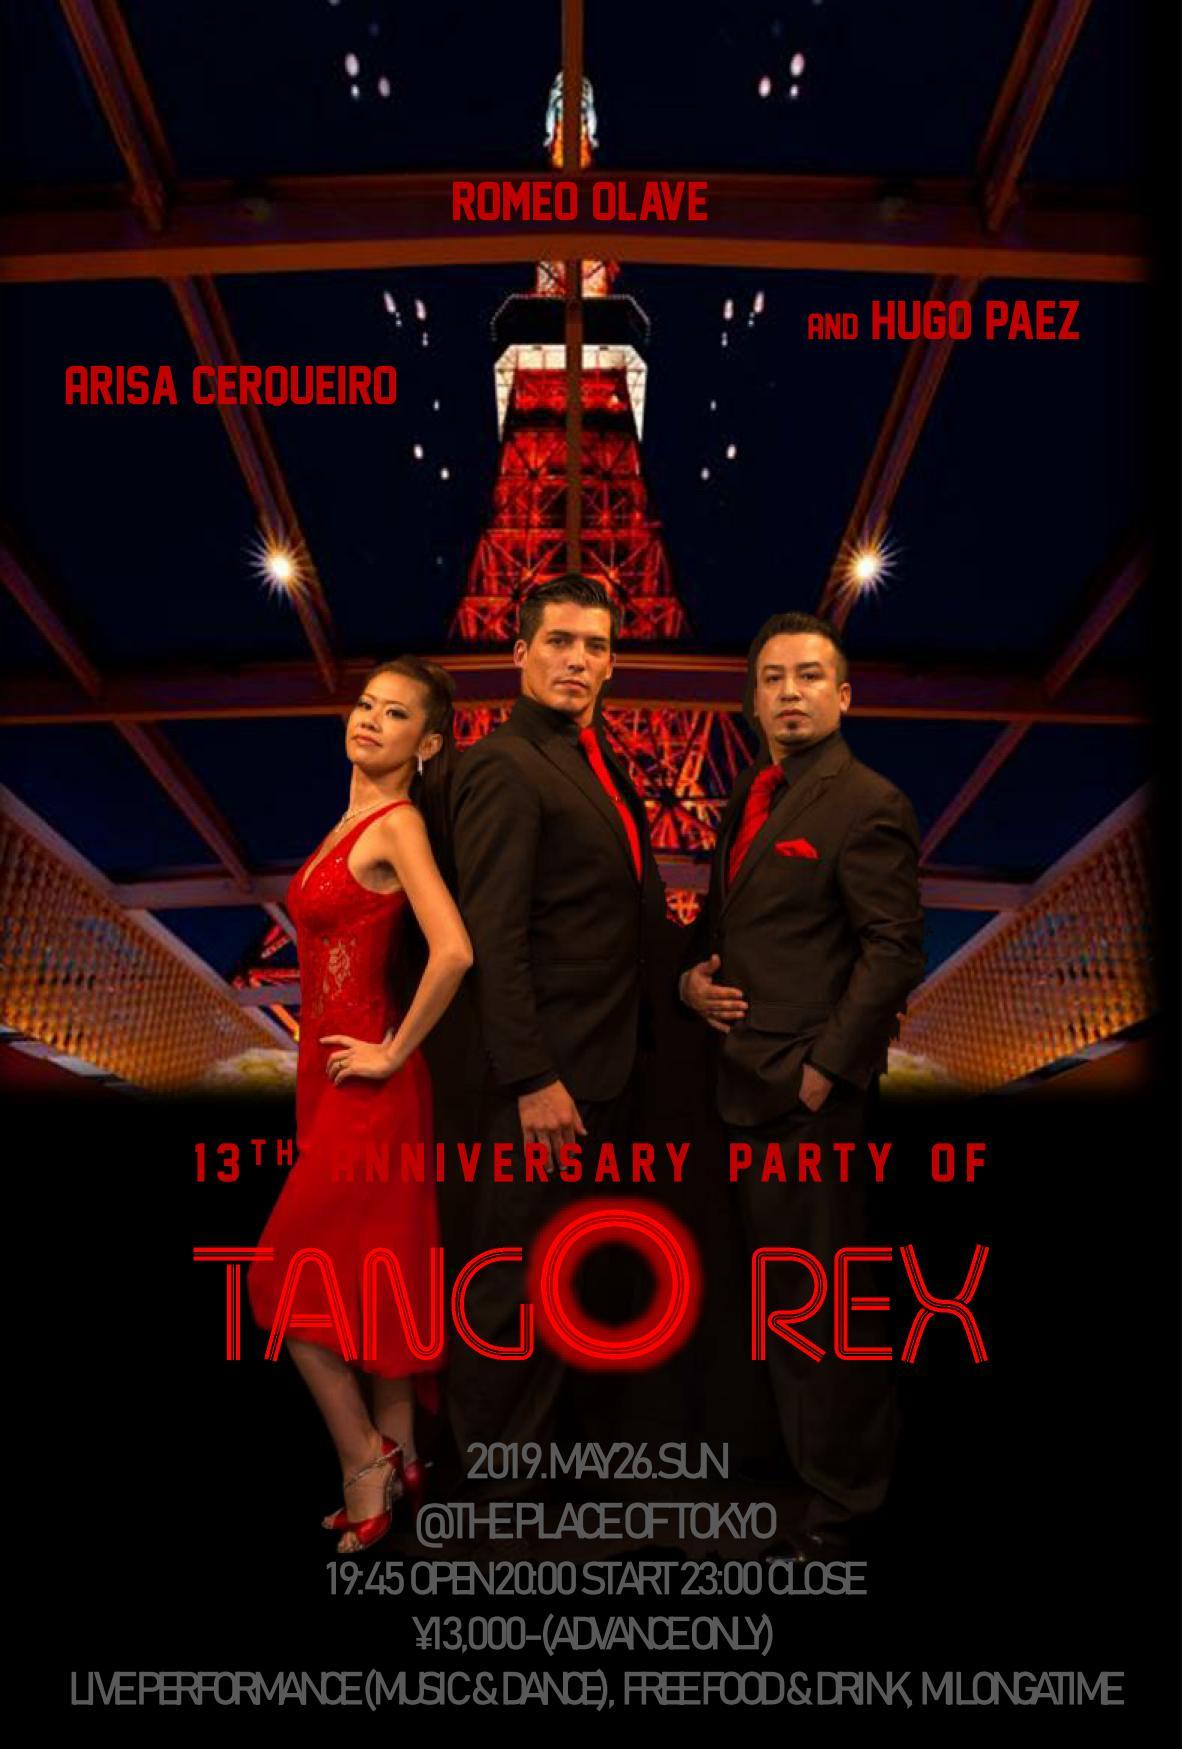 5/26 Tango Rex 13th Anniversary